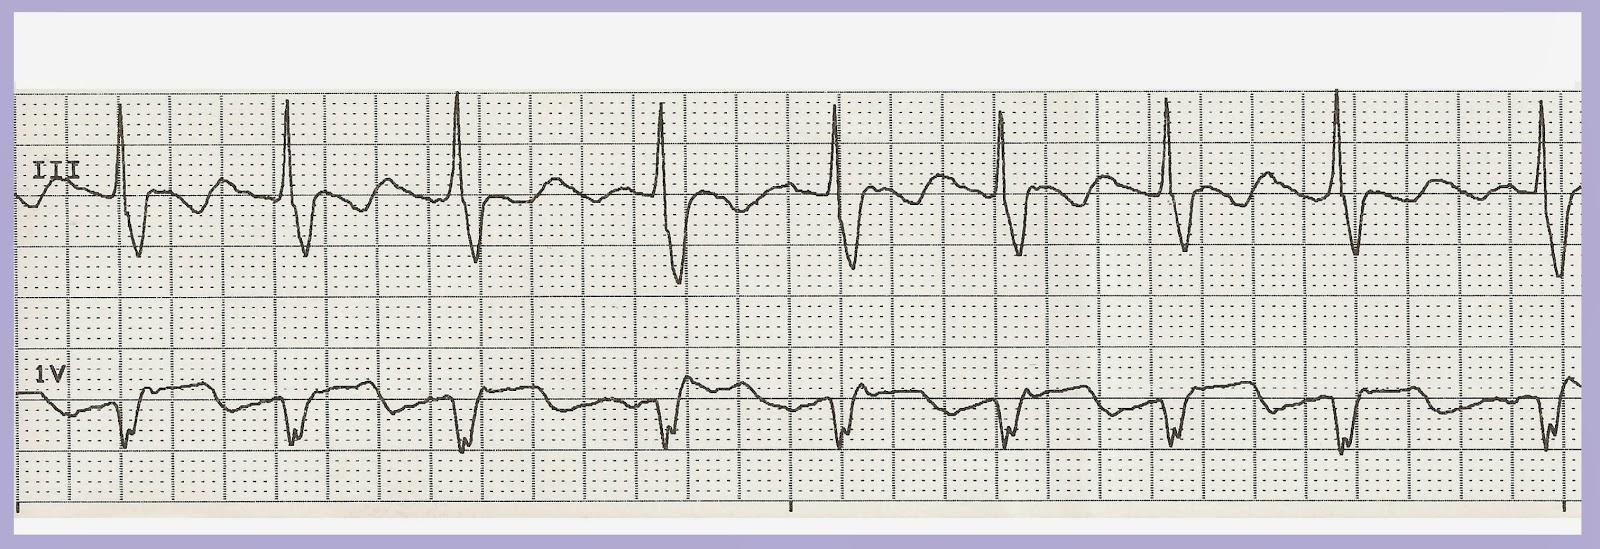 Float Nurse: Practice EKG Rhythm Strips 217